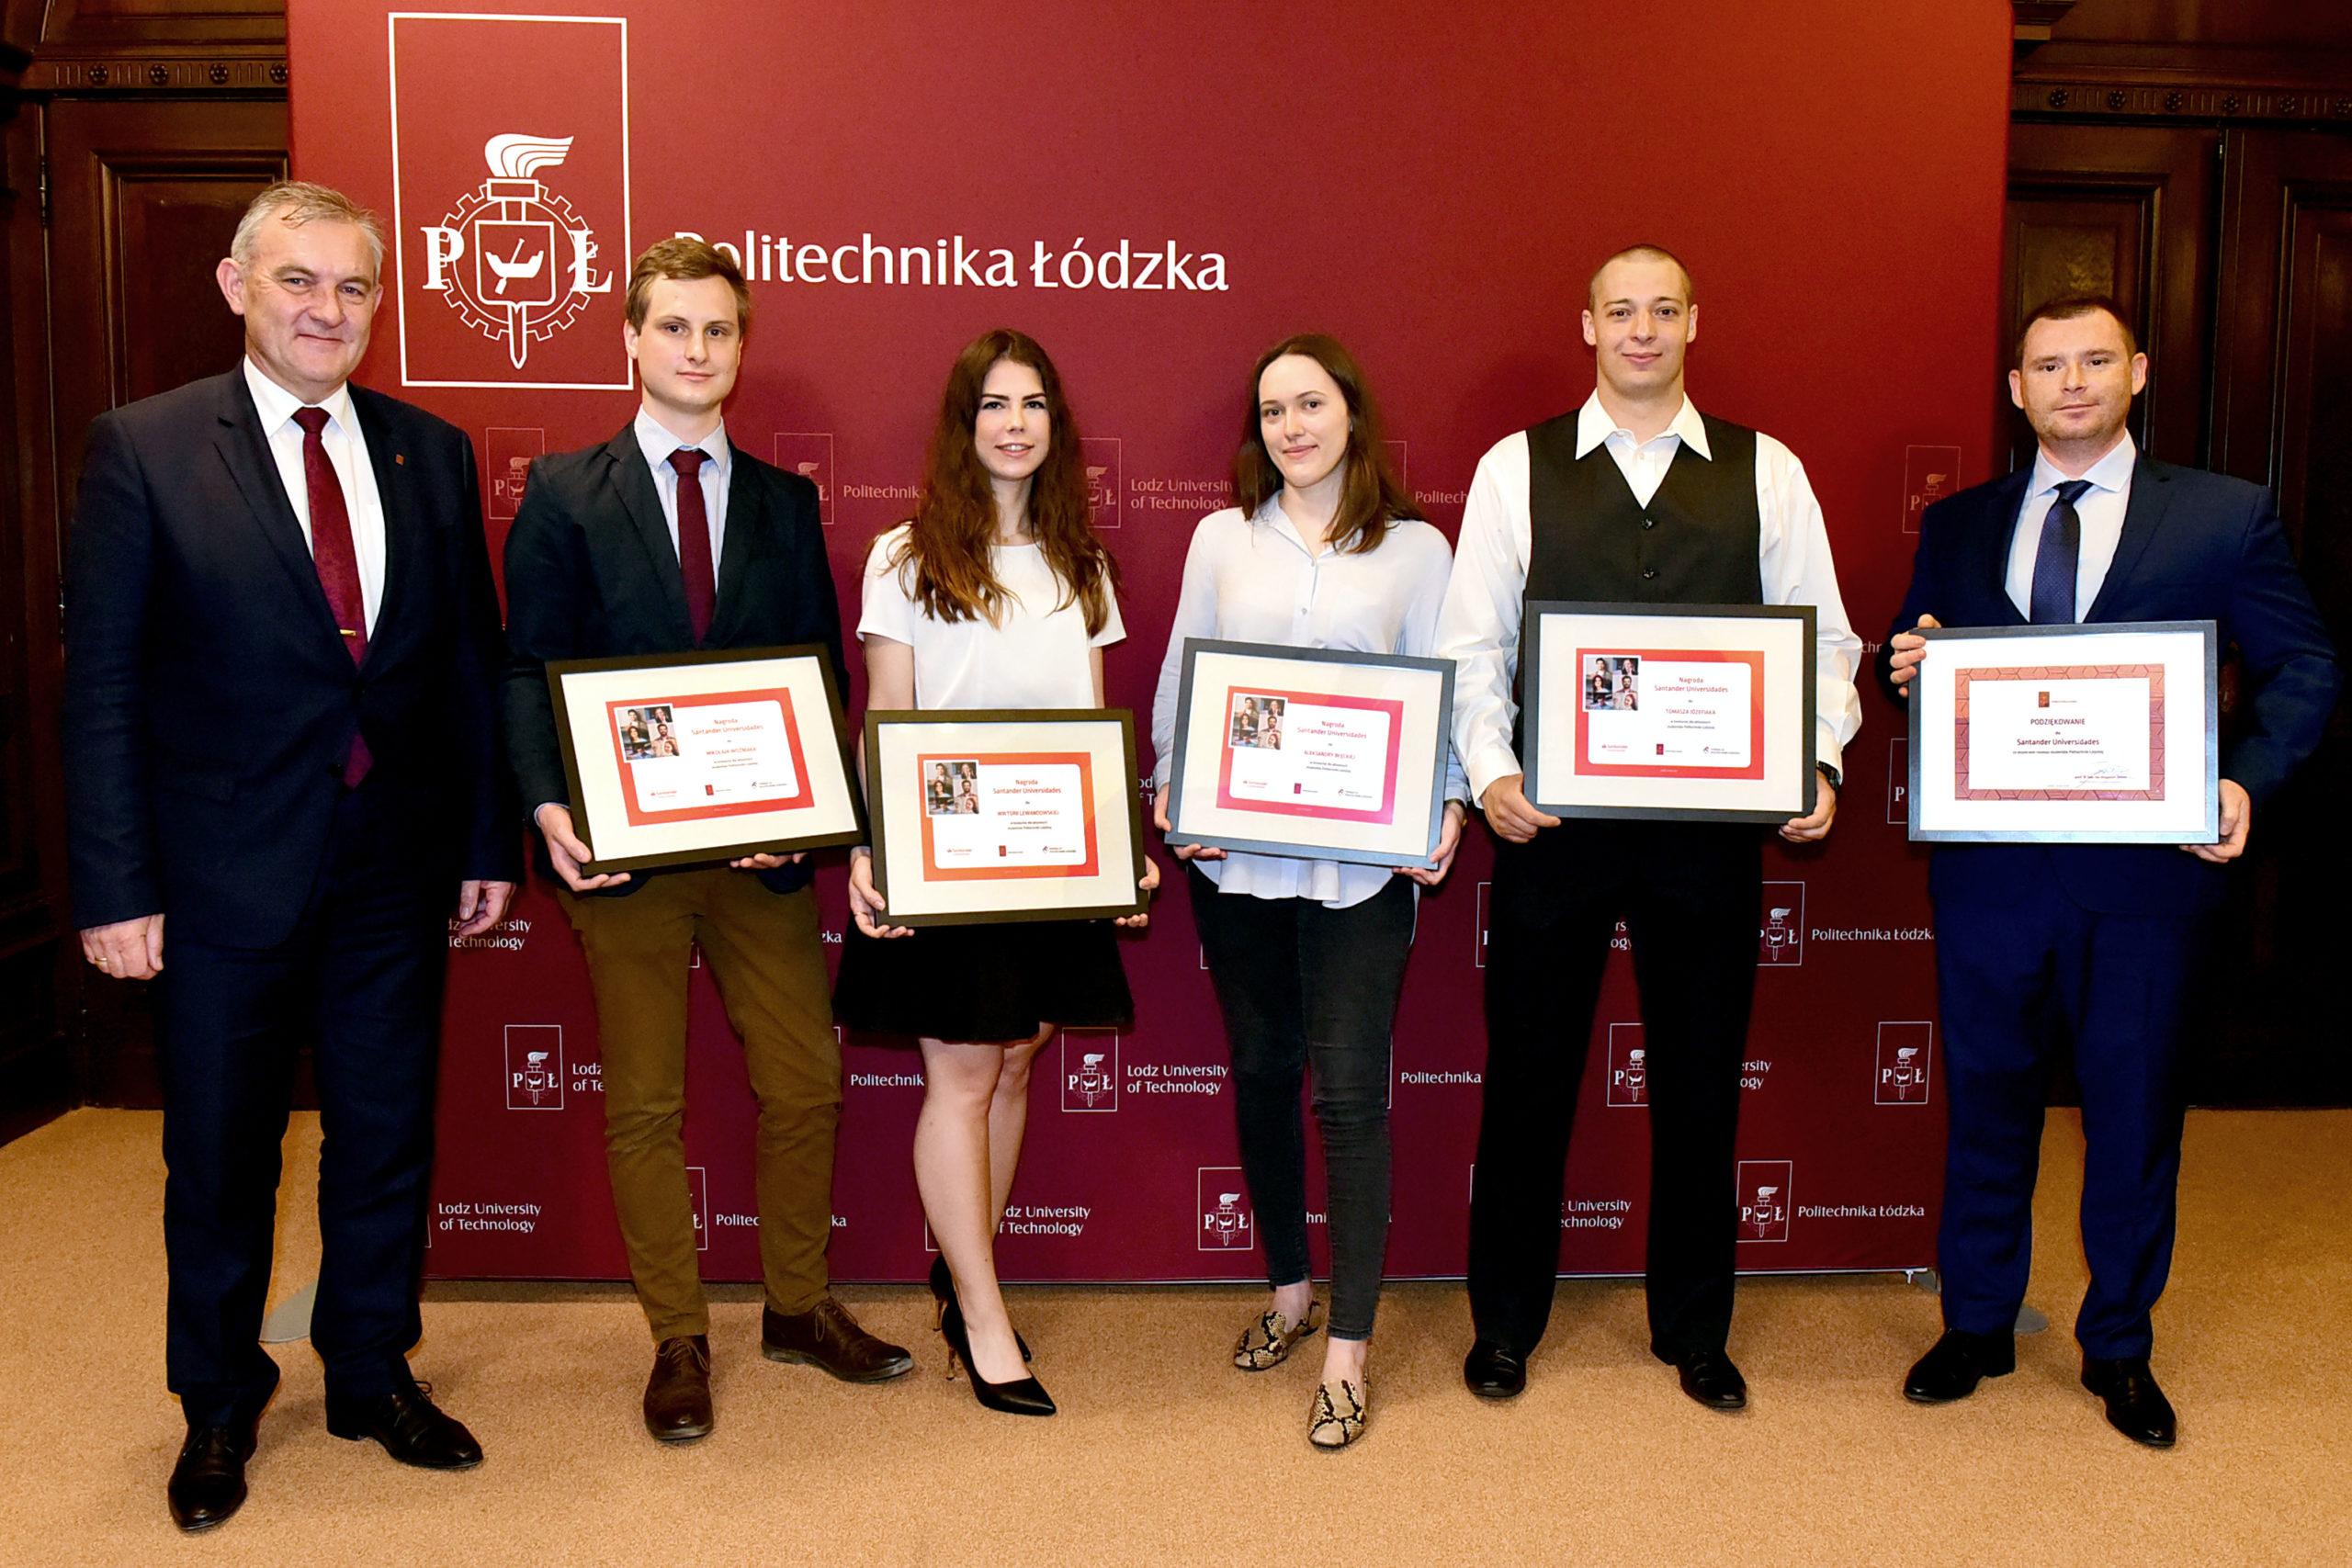 Wręczenie Nagród Santander Universidades